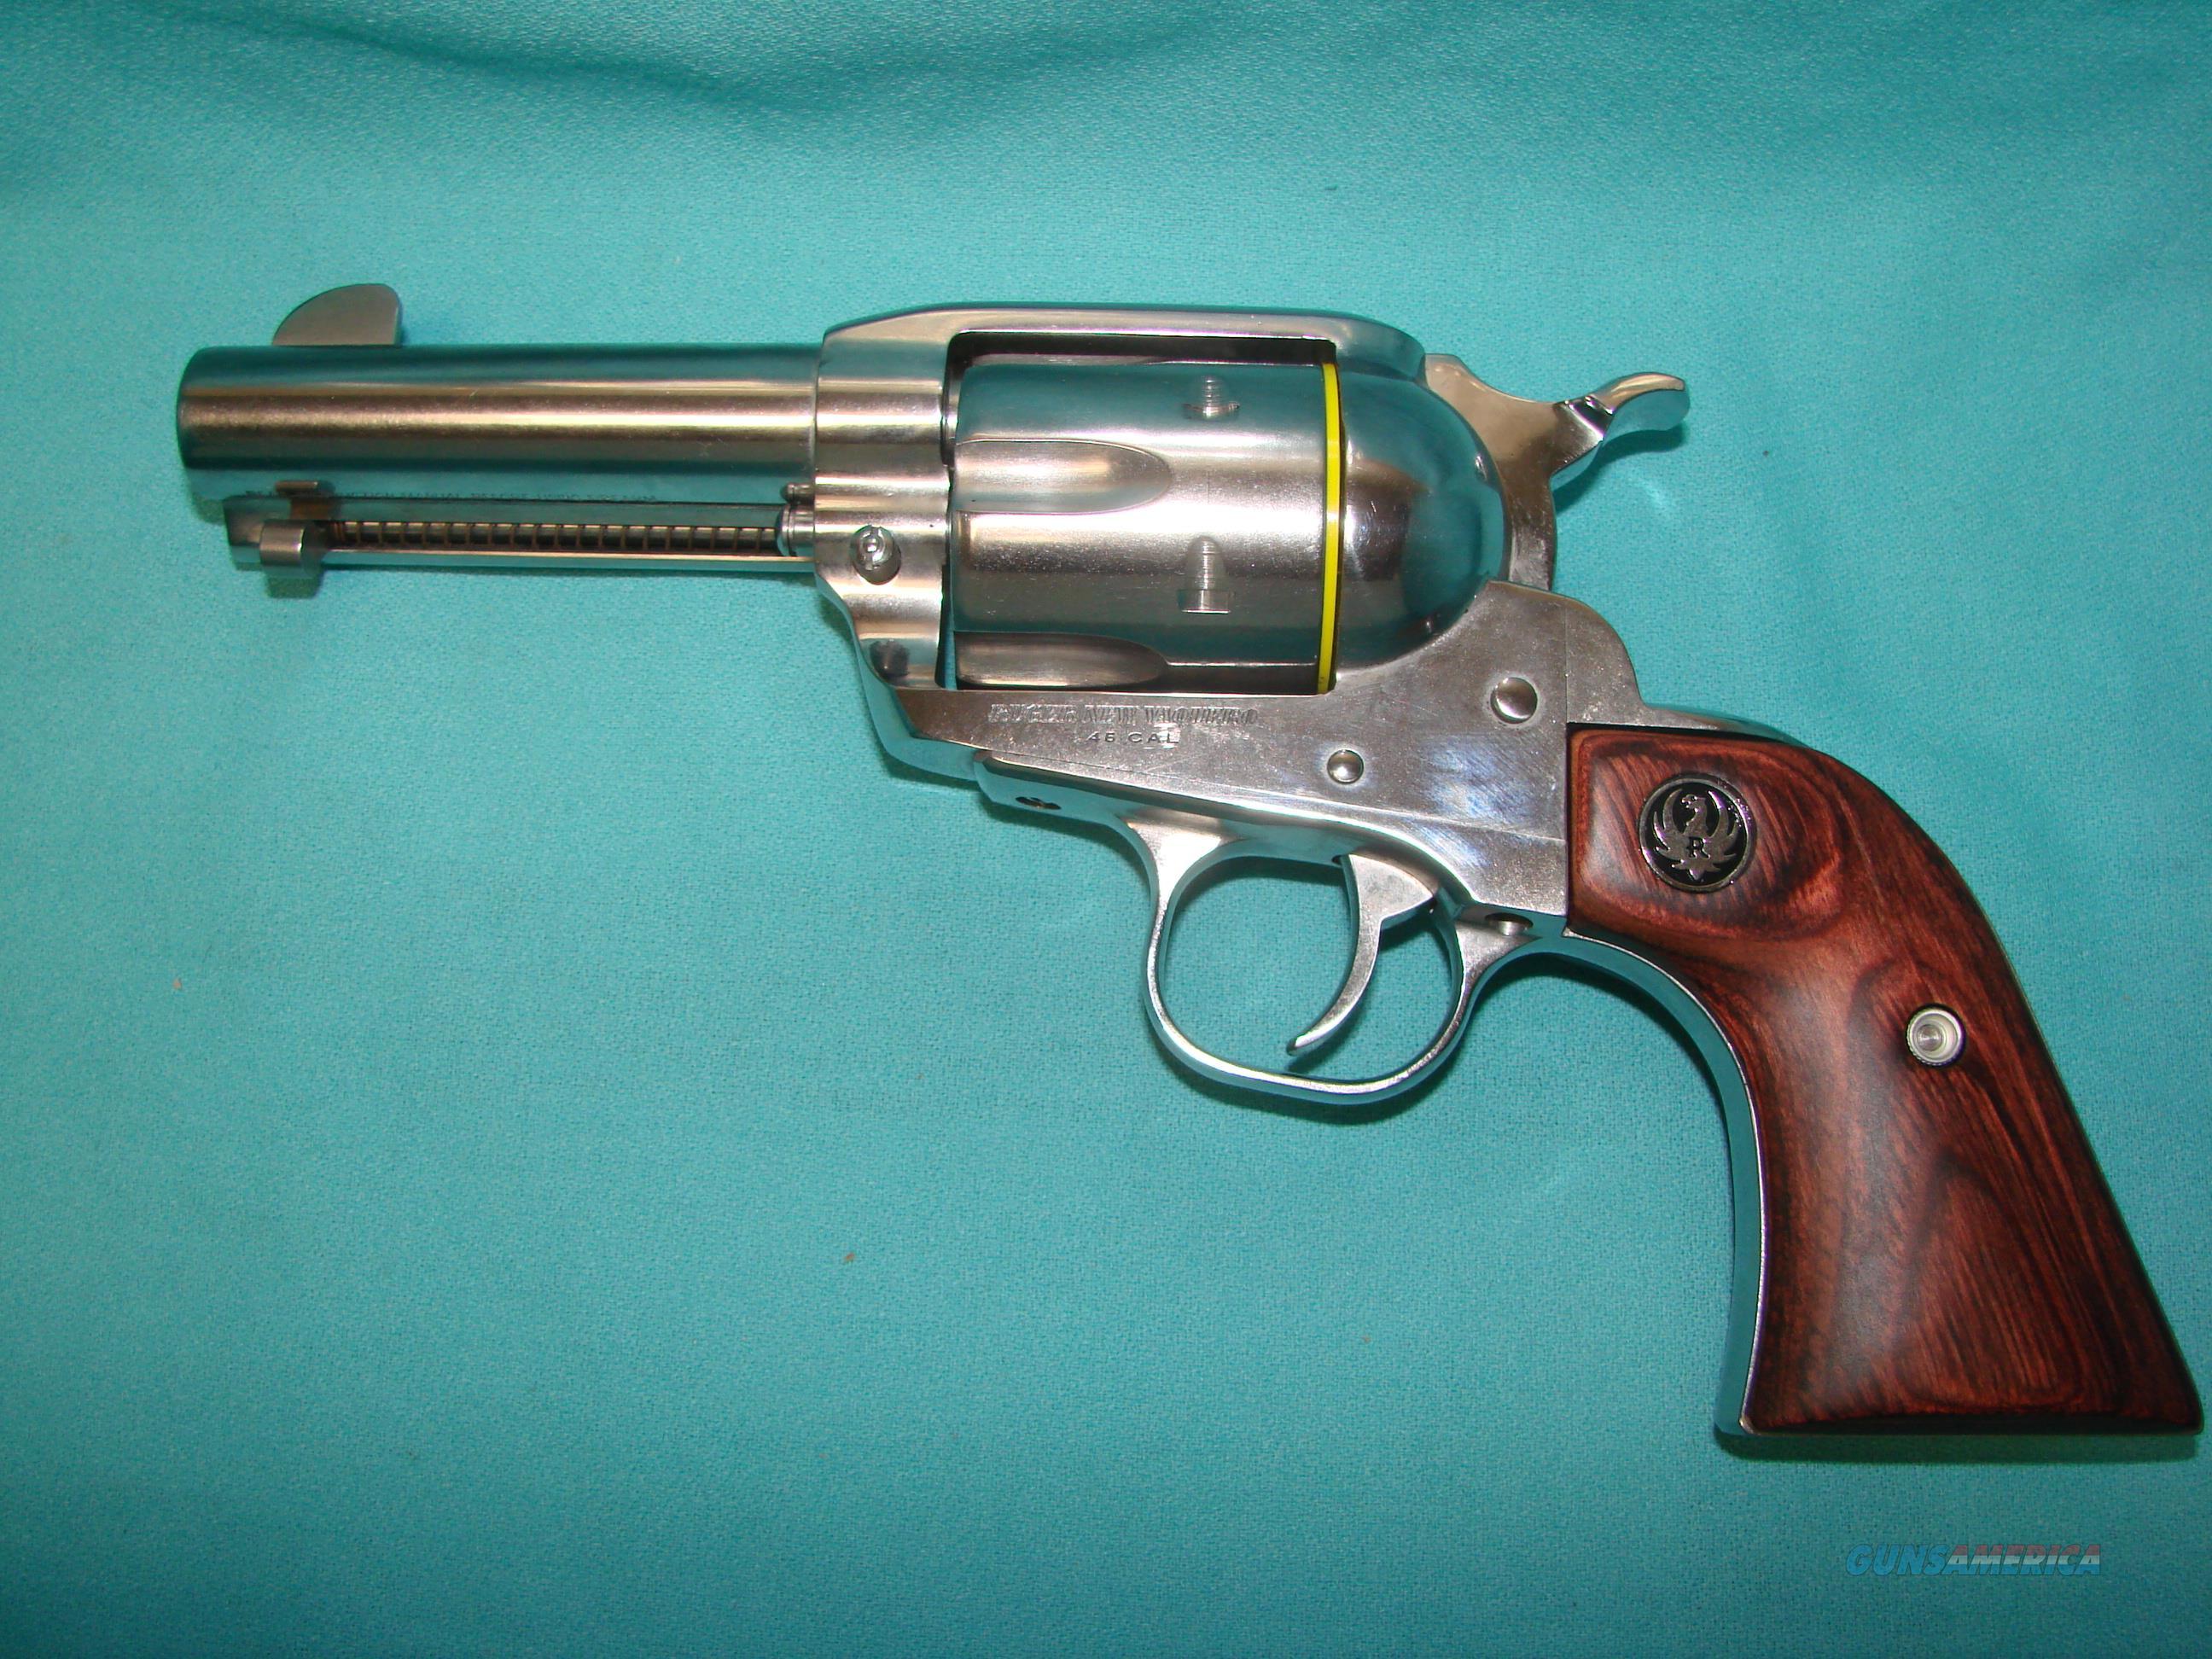 Ruger Vaquero Montado  Guns > Pistols > Ruger Single Action Revolvers > Cowboy Action